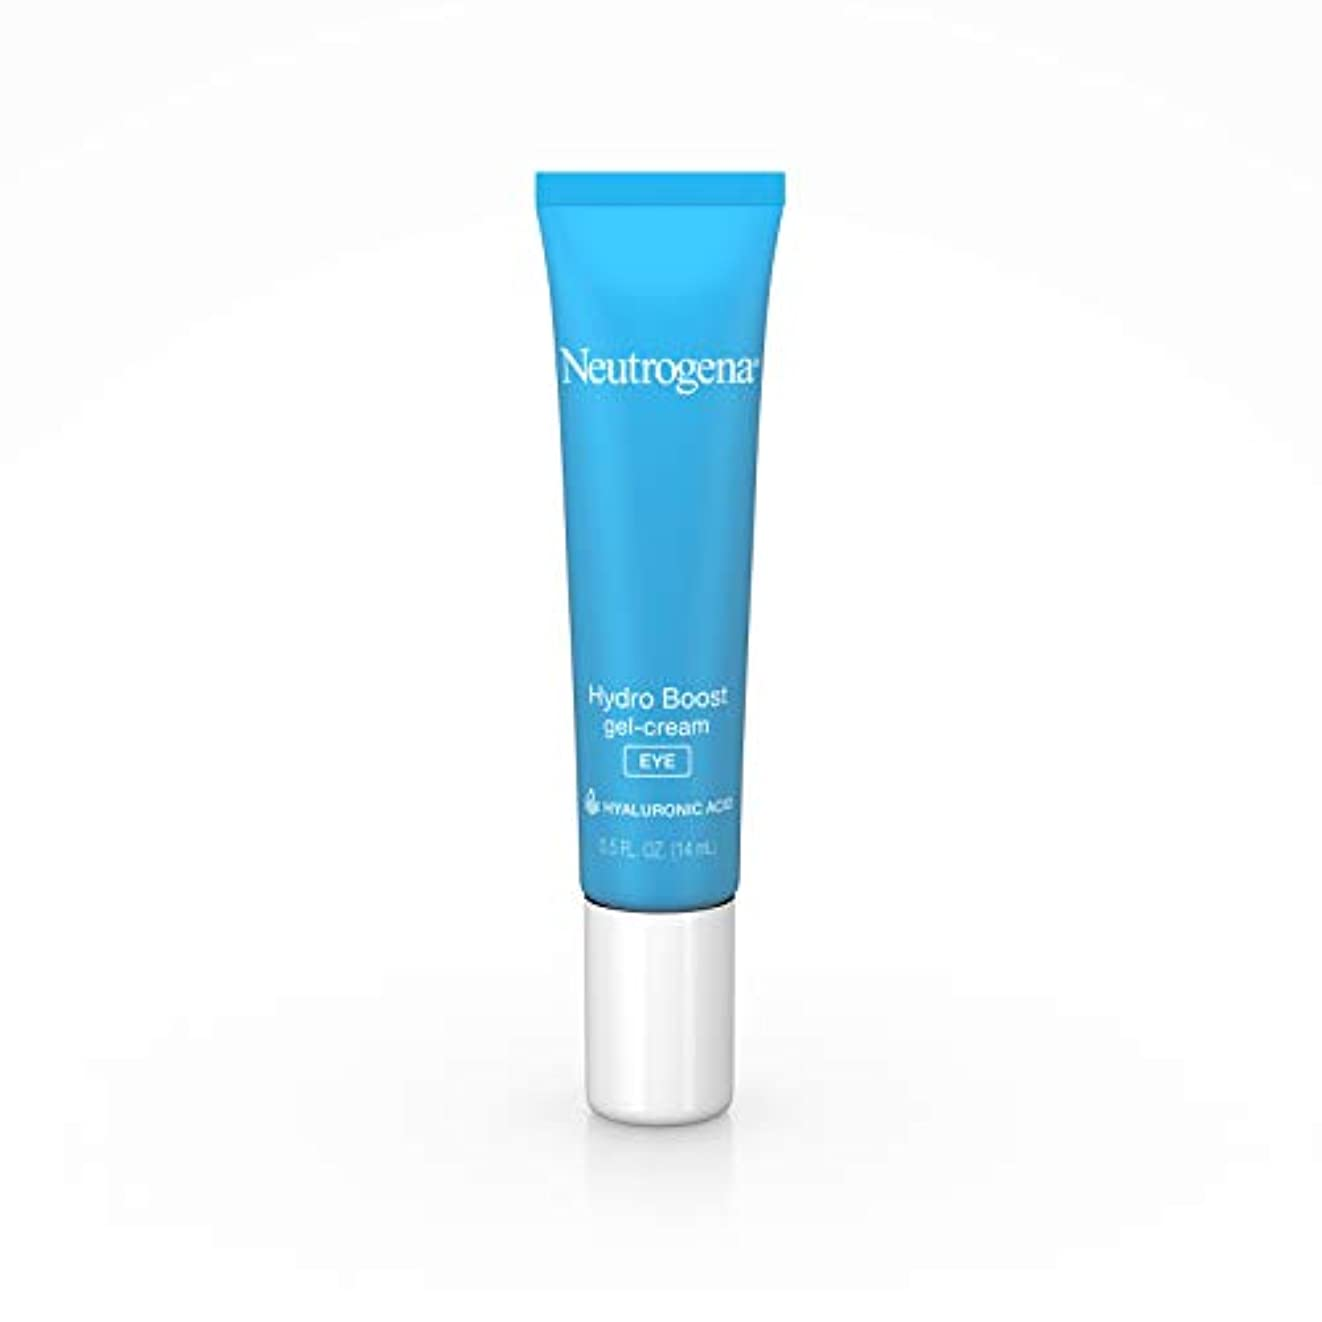 Neutrogena Hydro Boost gel-cream、extra-dryスキン